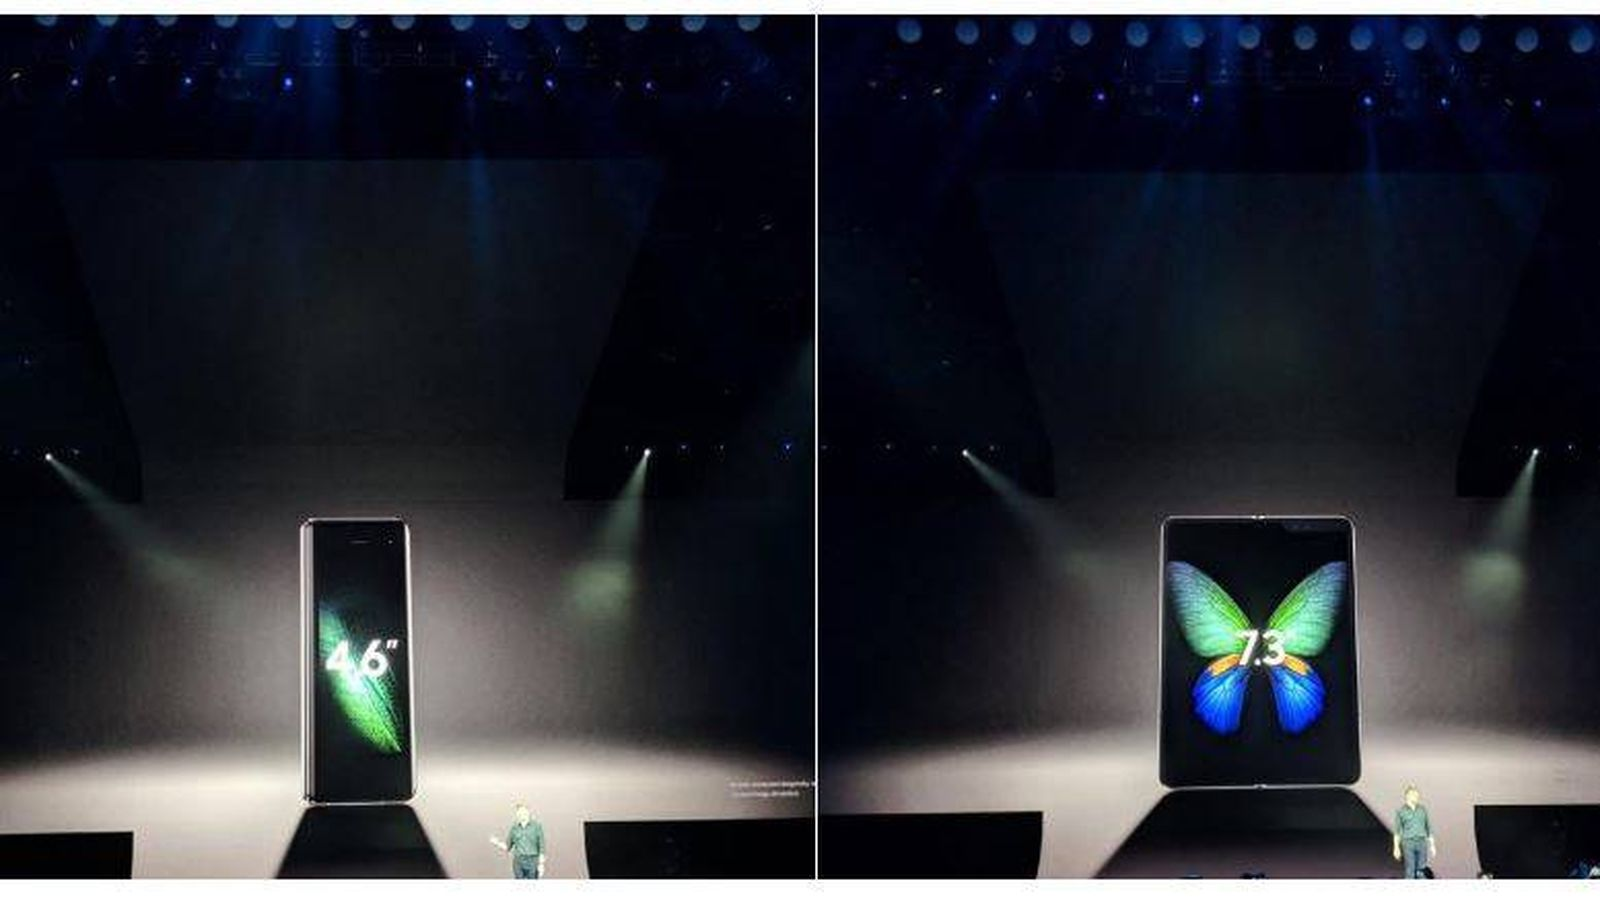 0e3d55ee06f Móviles: Samsung Galaxy Fold: este móvil plegable (por fin) no es un  experimento